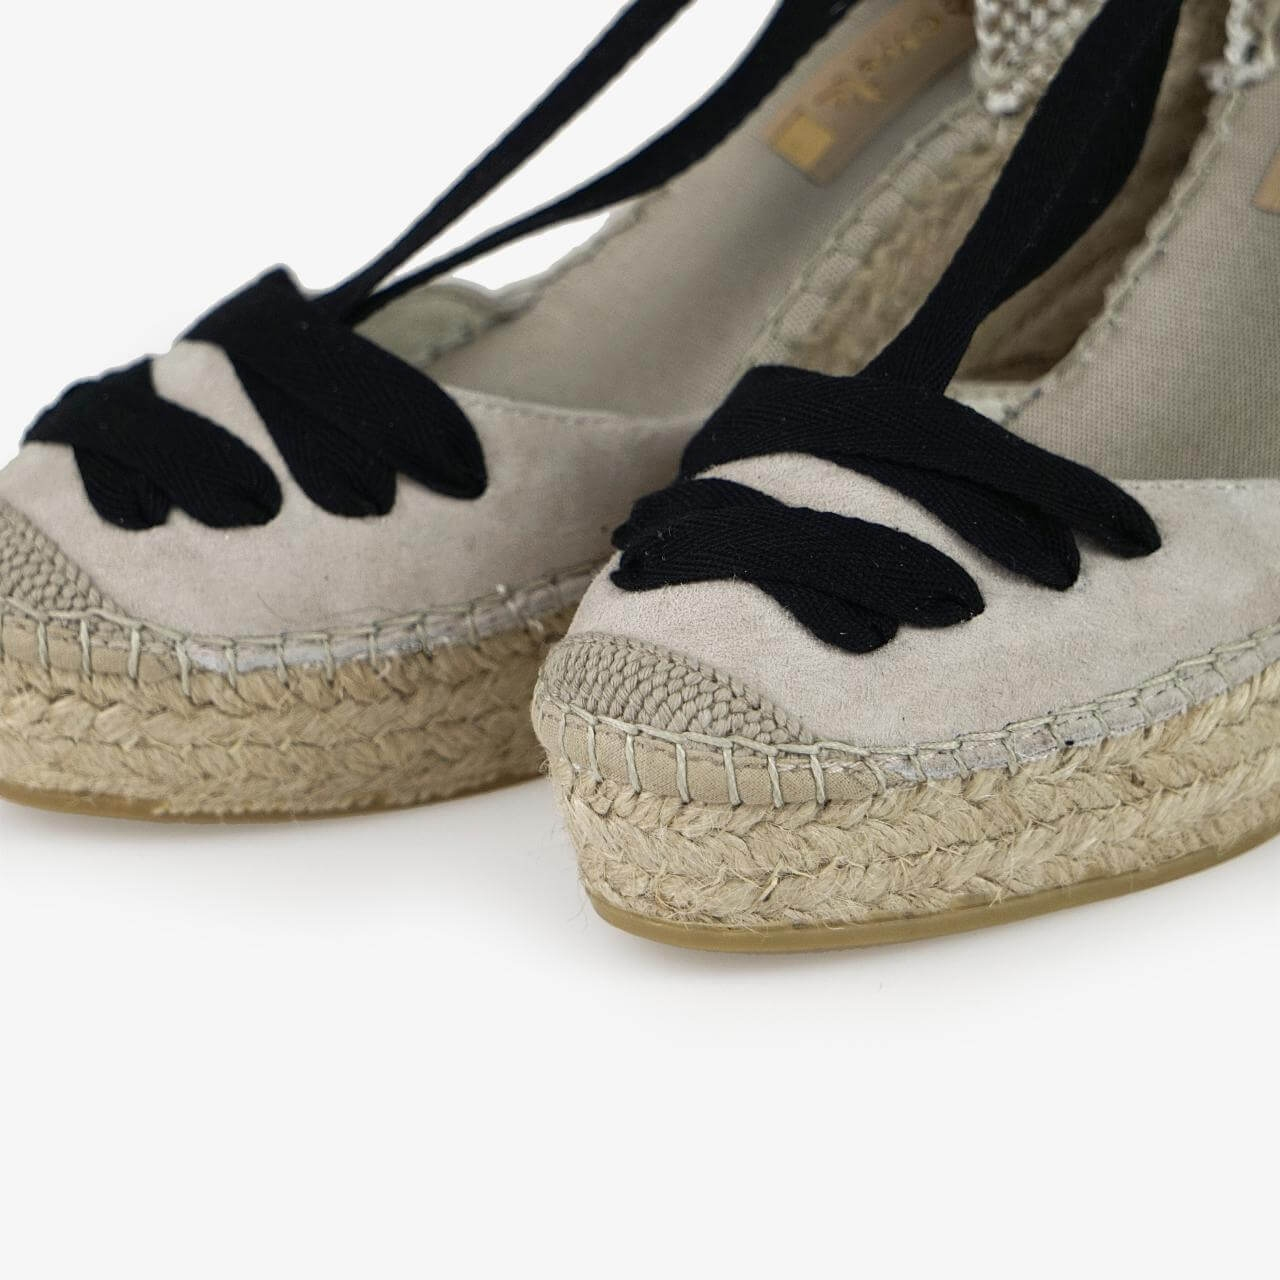 sandalias cuña - Ítem2